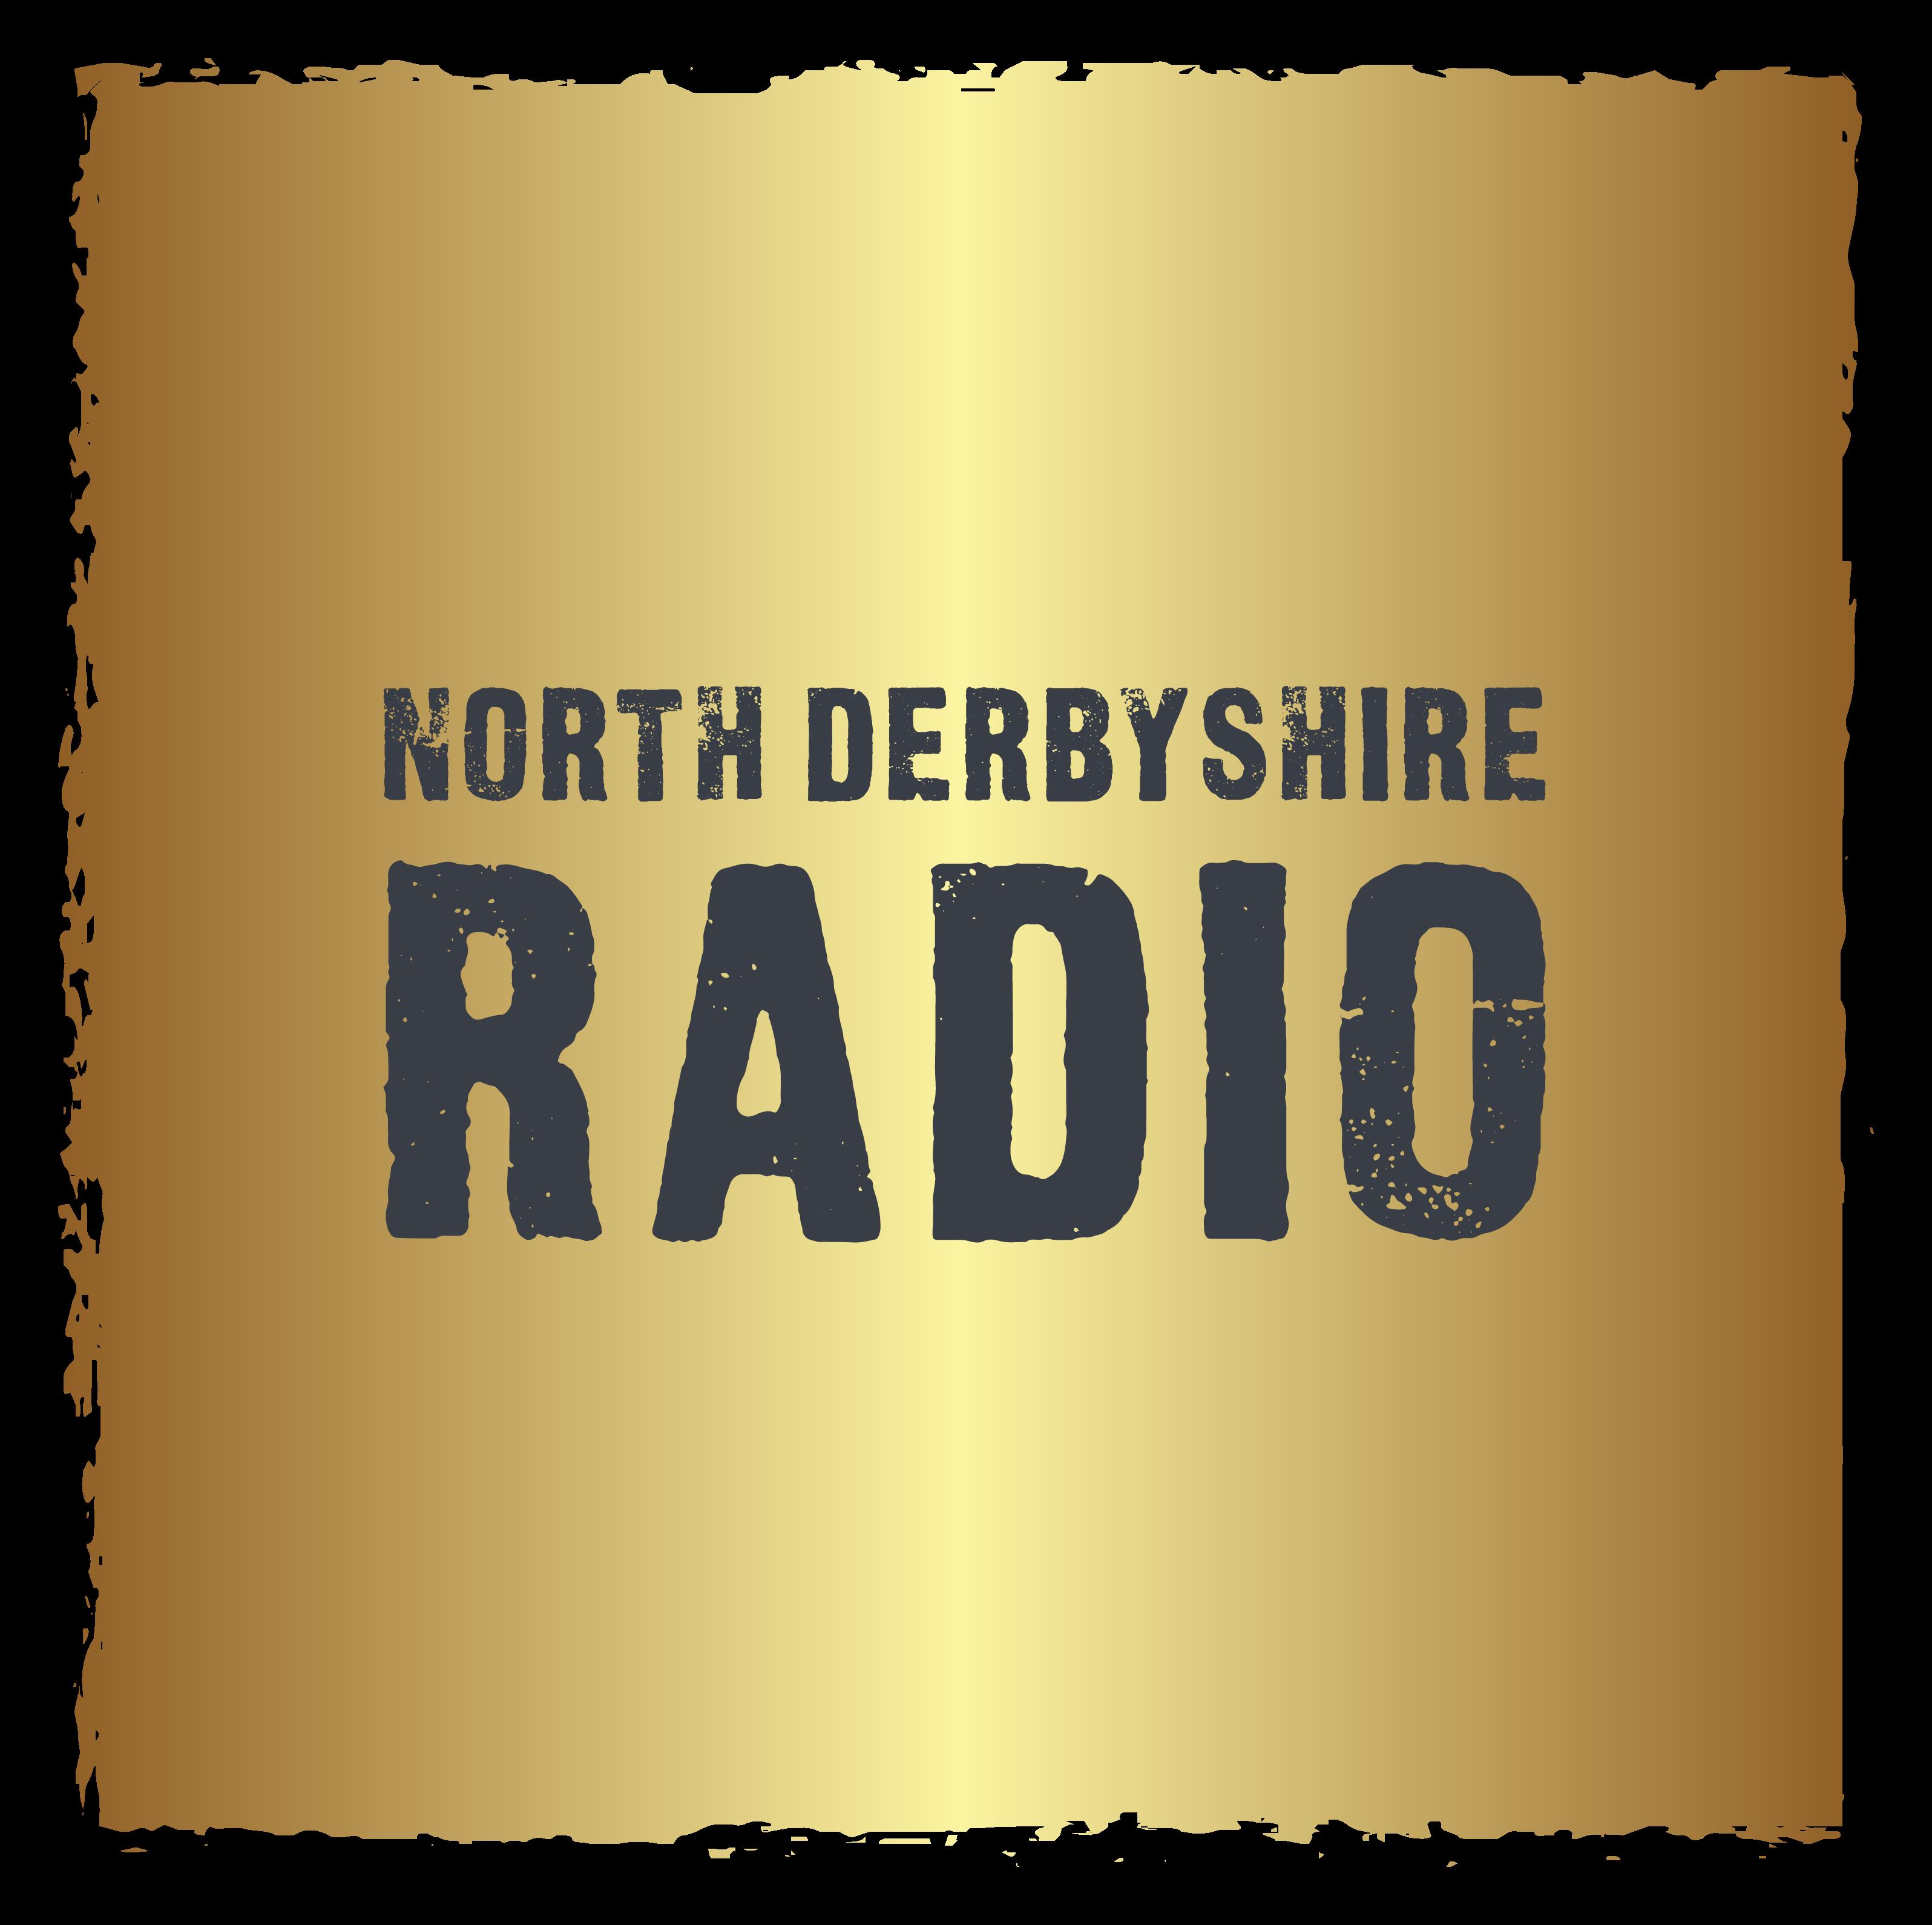 North Derbyshire Radio